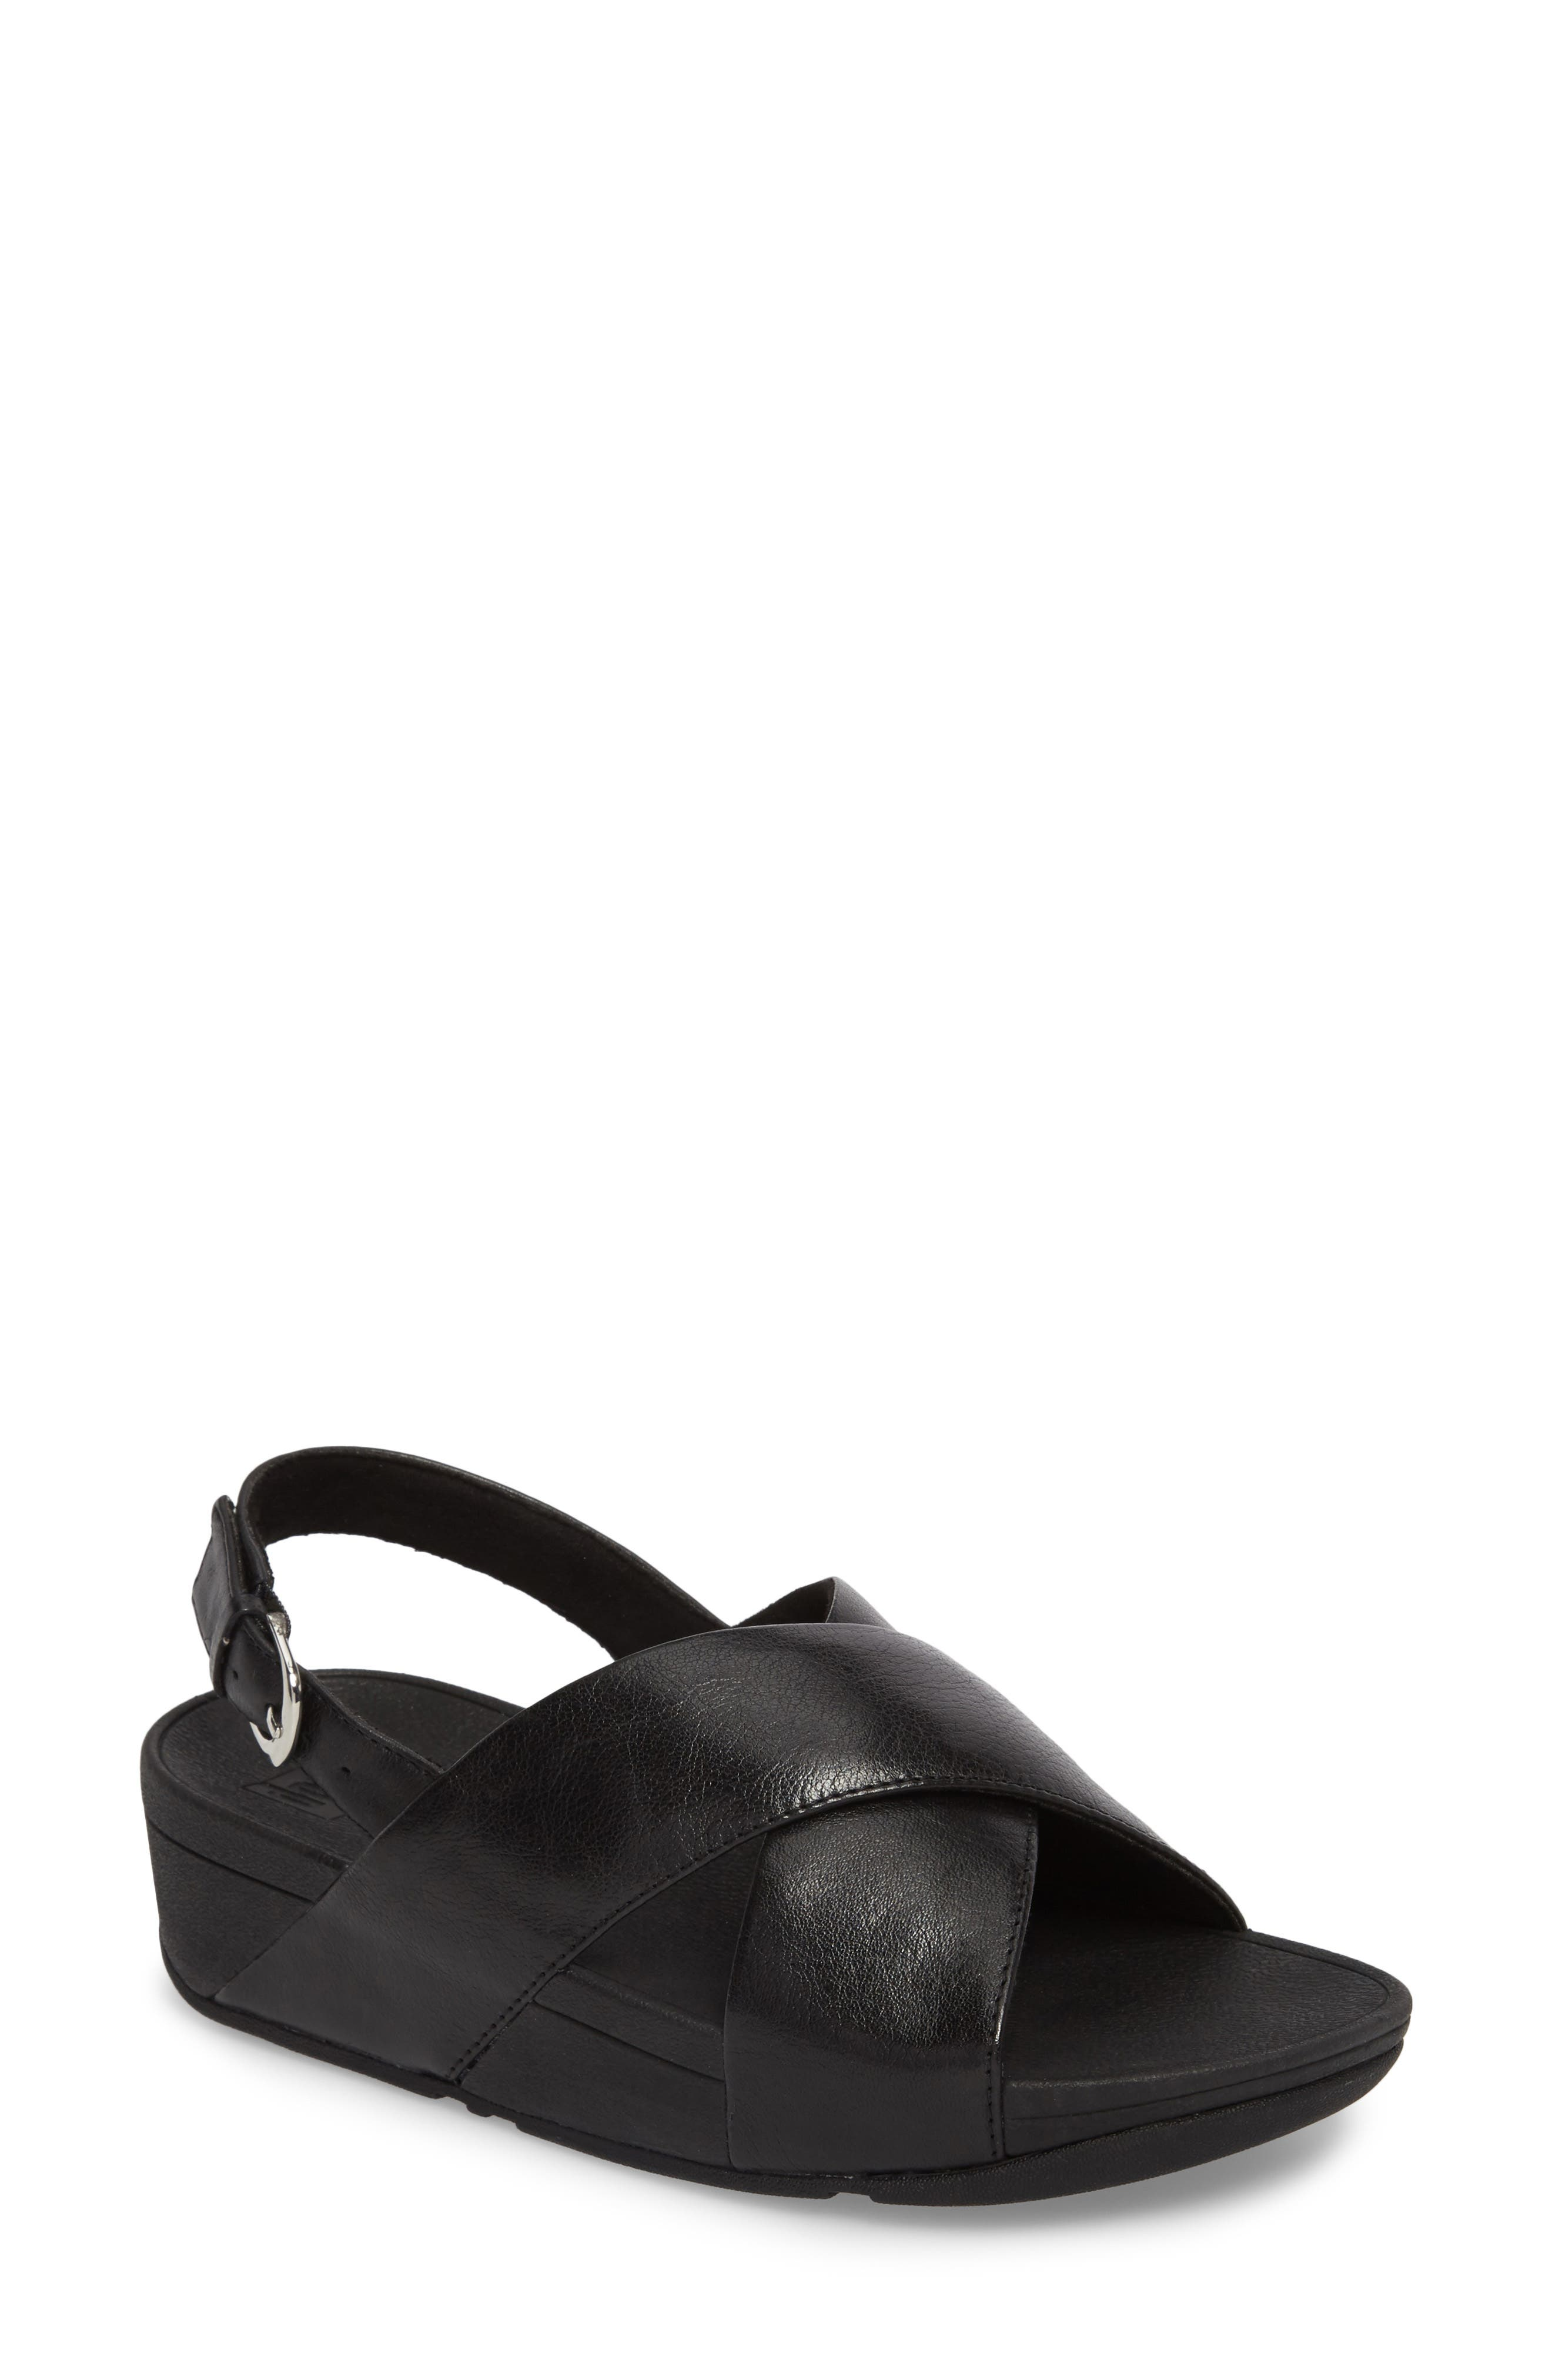 Lulu Crisscross Sandal,                         Main,                         color, BLACK